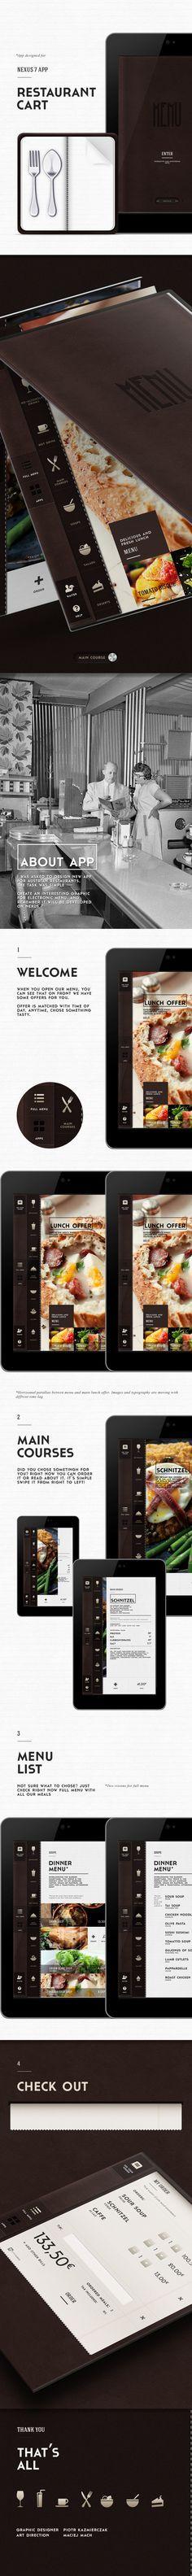 500 Best Ux Design Images User Experience Design Design Experience Design